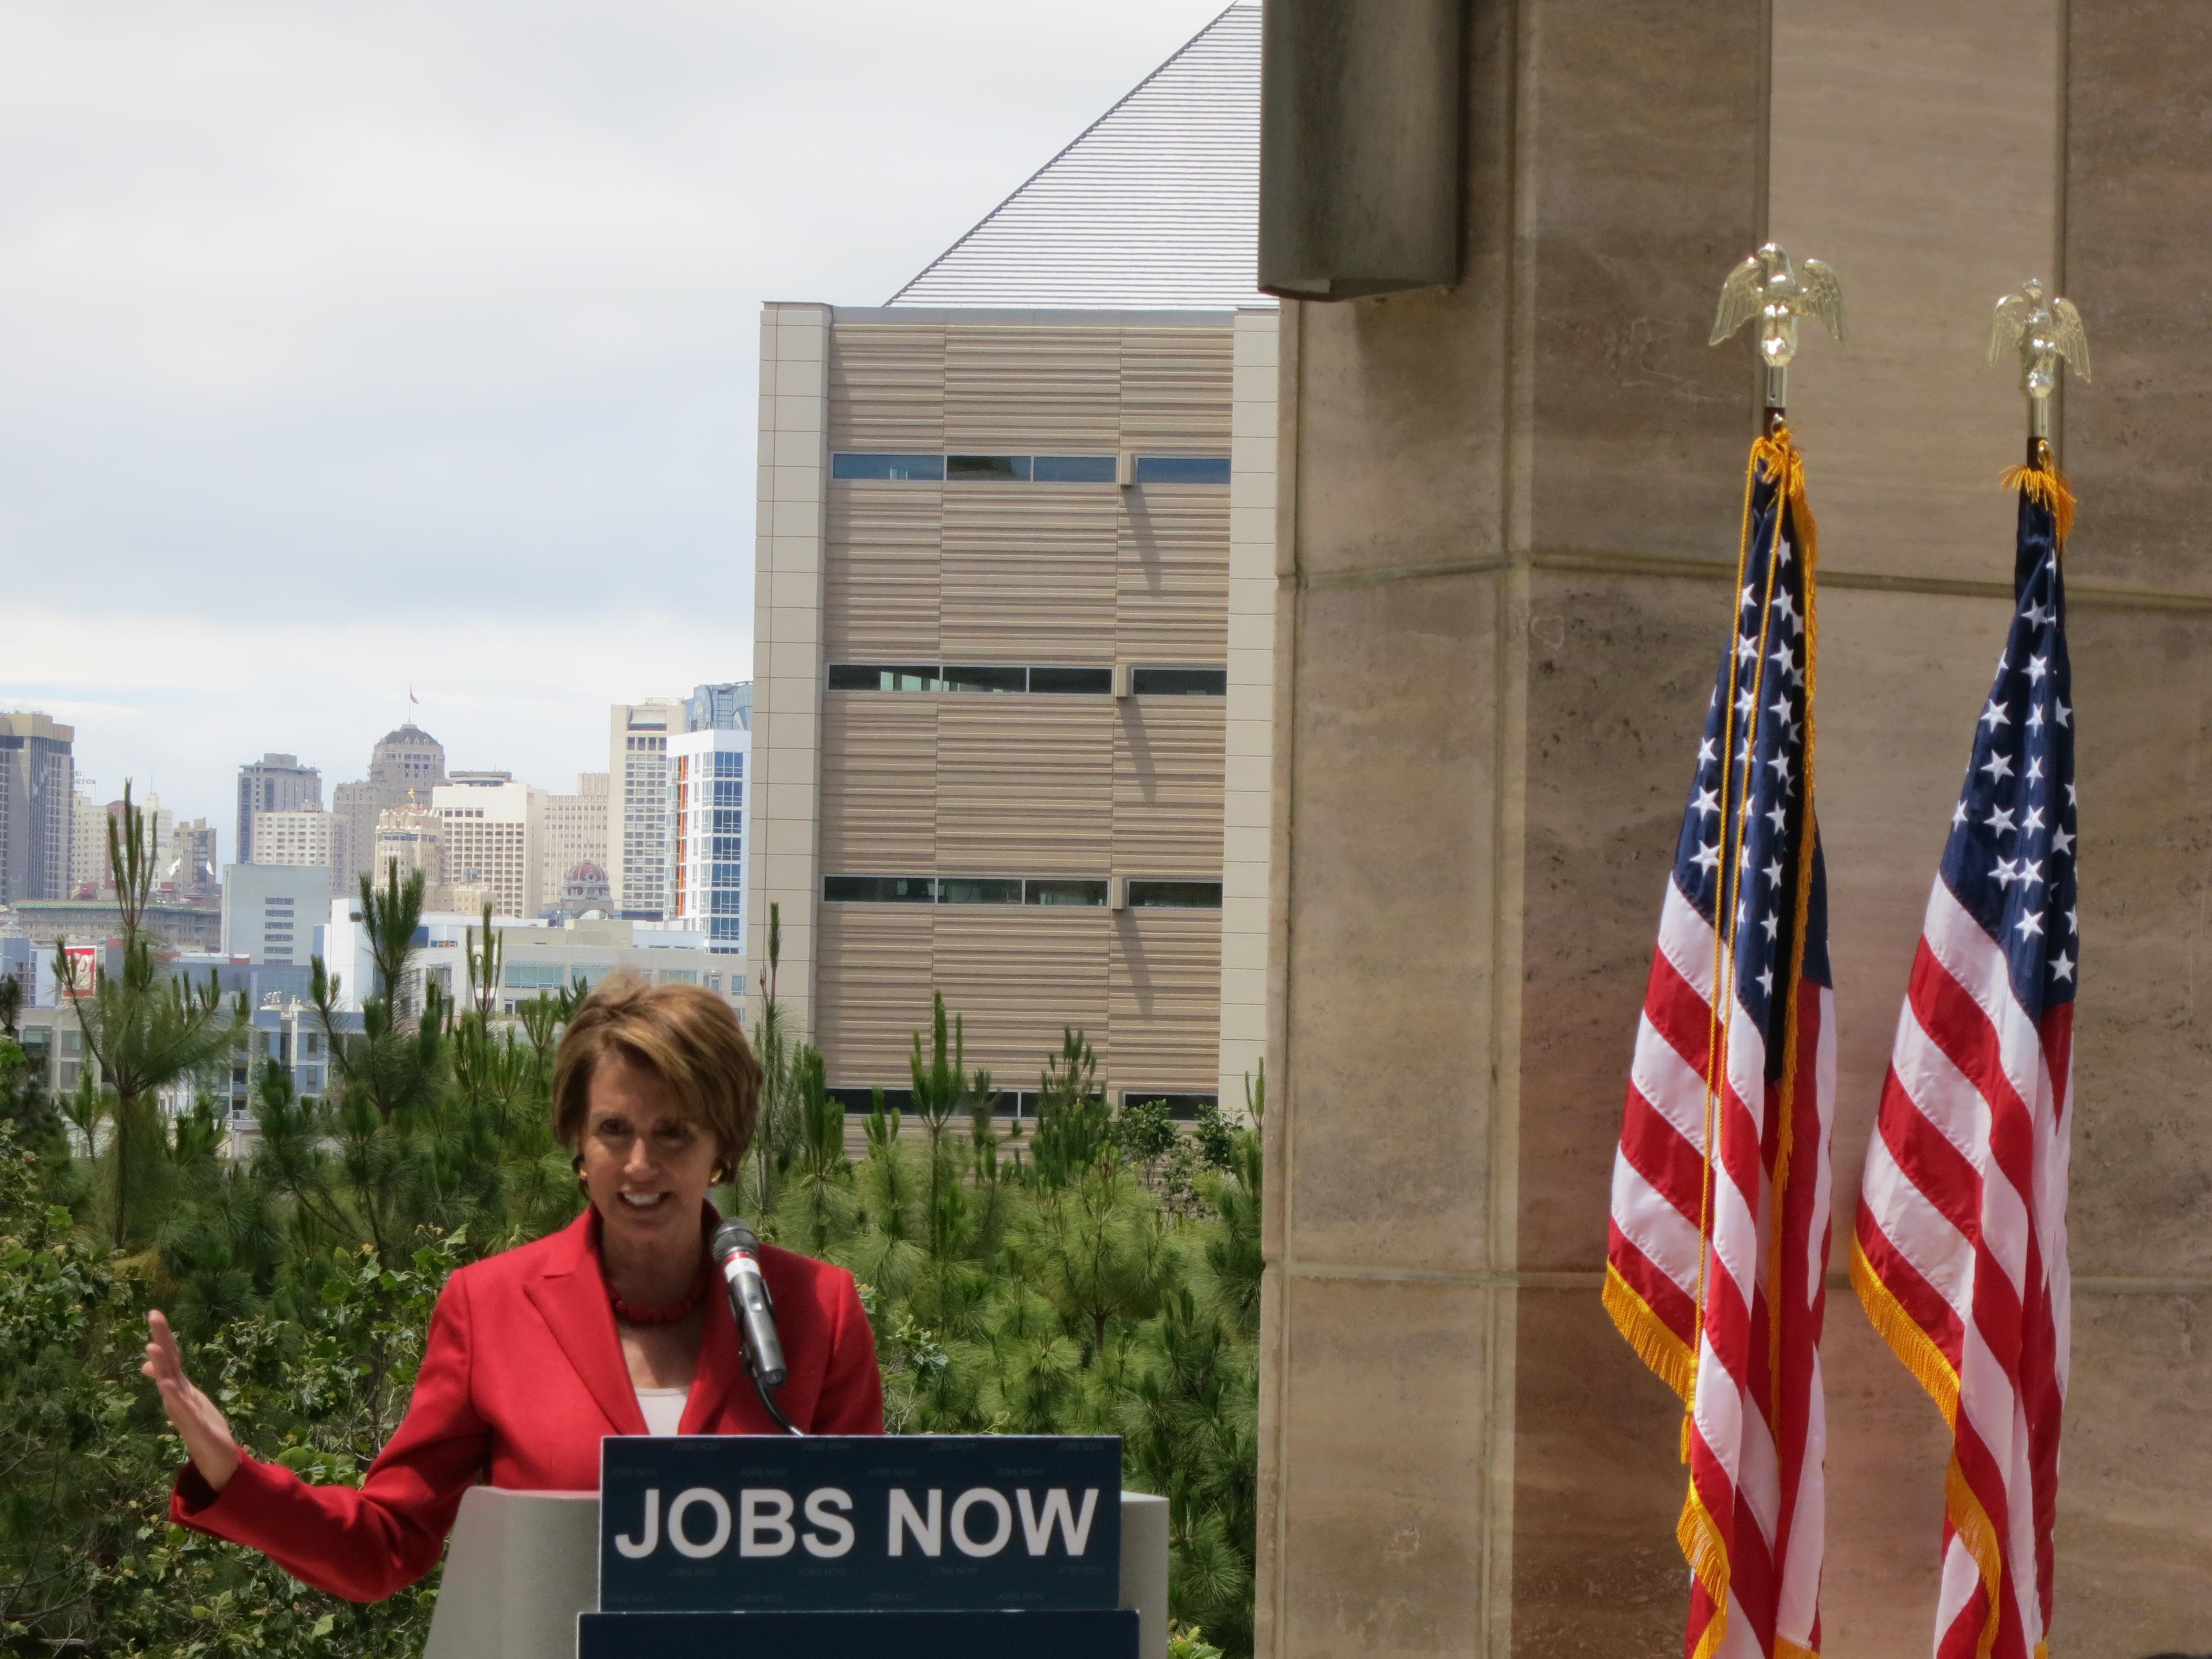 File:Congresswoman Pelosi at San Francisco's Mission Bay